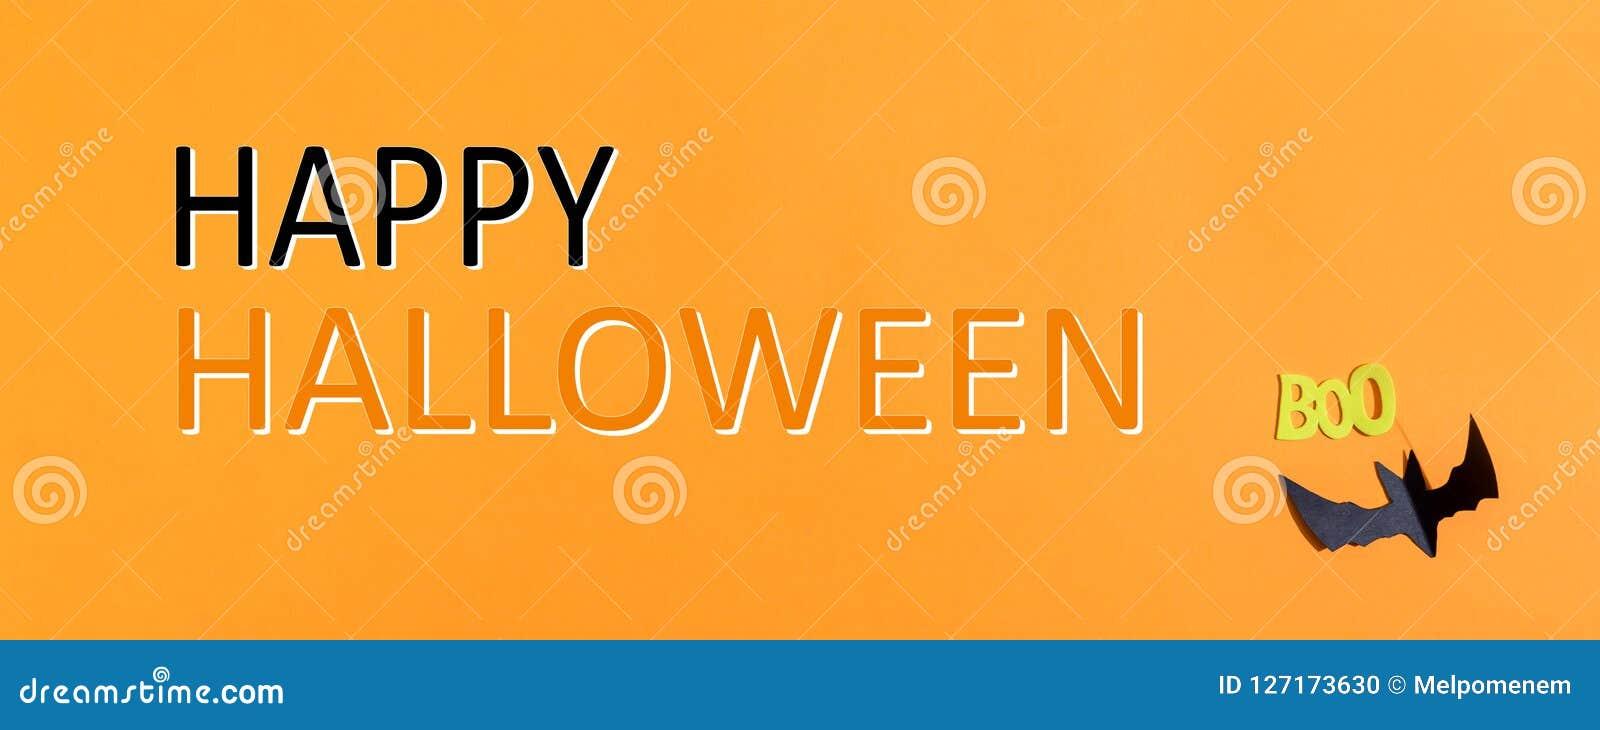 Happy Halloween message with paper bat